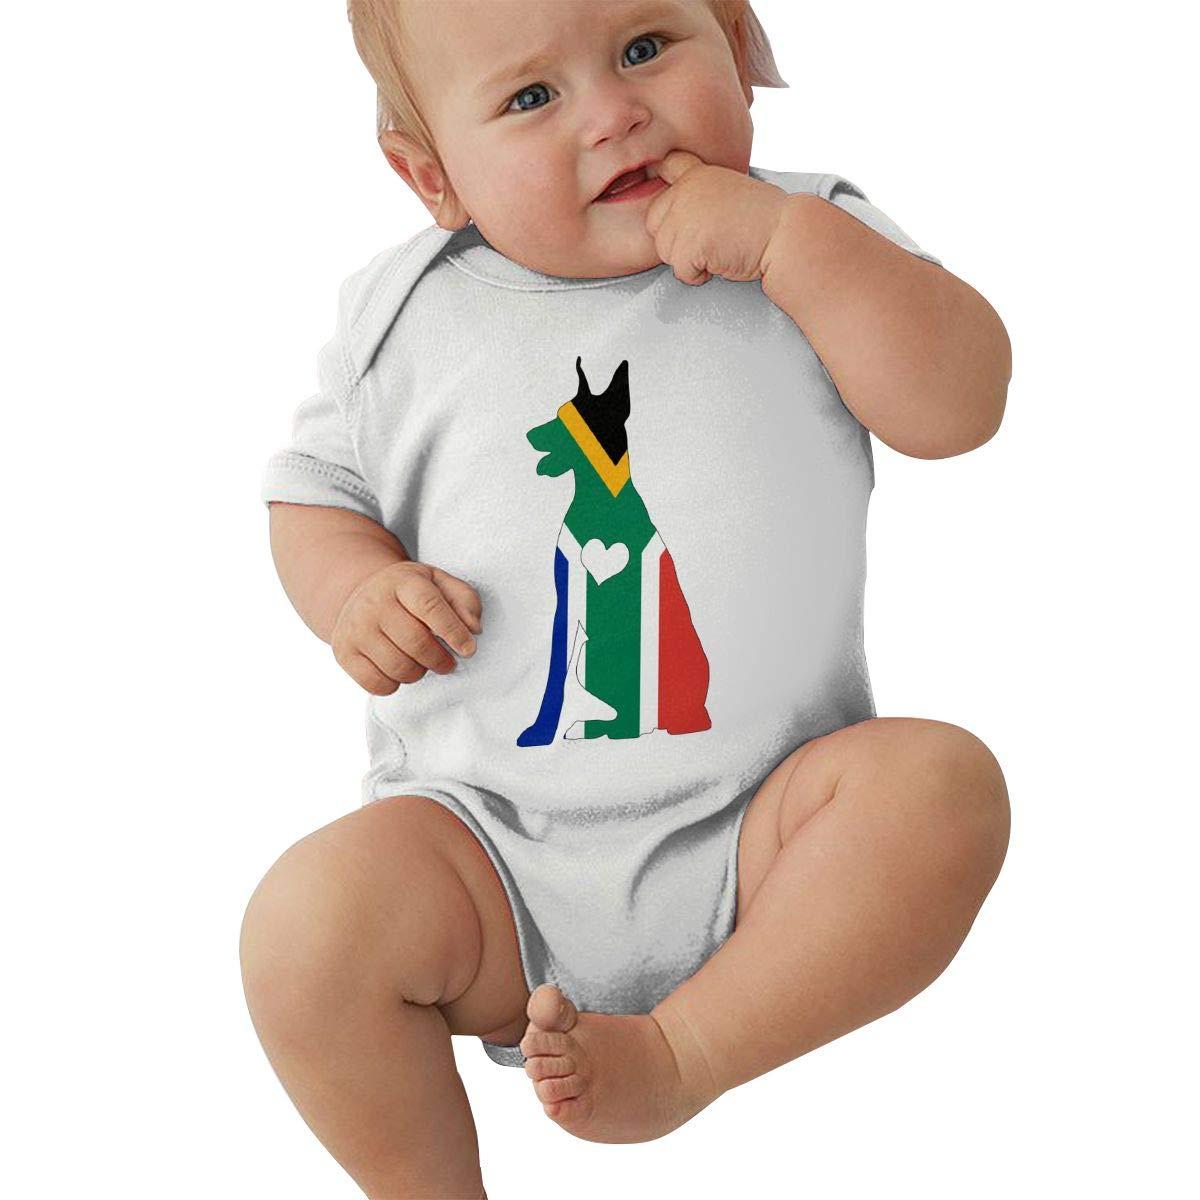 Mri-le2 Baby Boy Girl Short Sleeve Jumper Bodysuit South African Flag Adore Dobermans Kid Pajamas